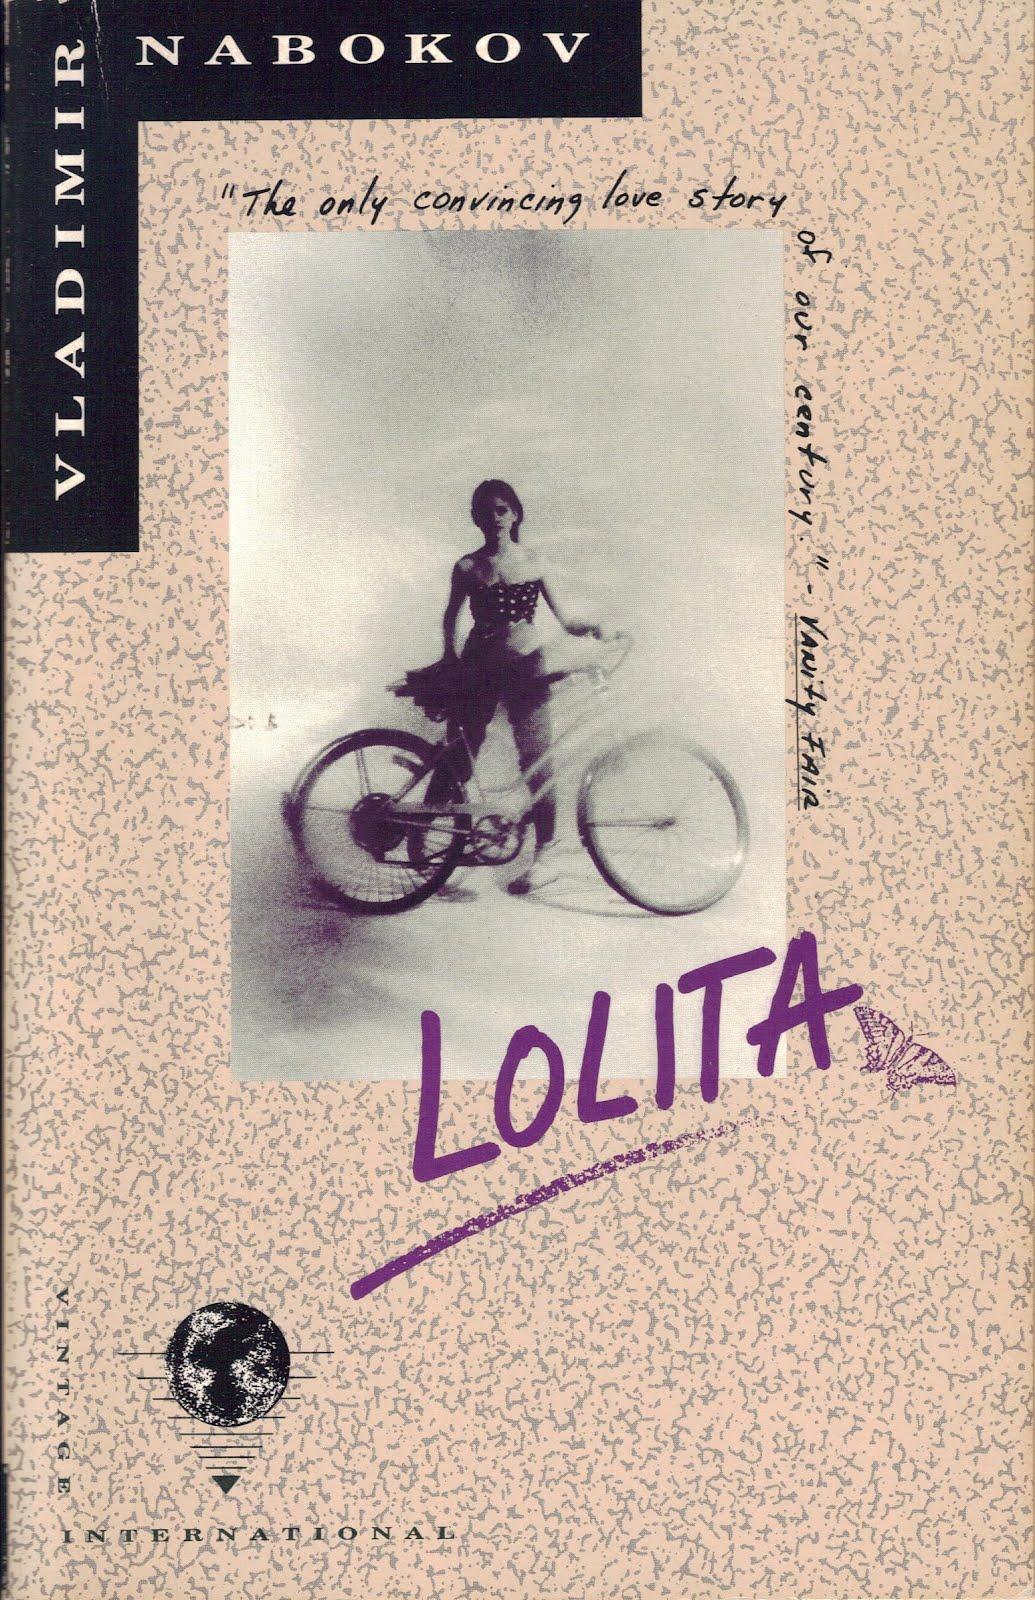 nabokov_-lolita.jpg